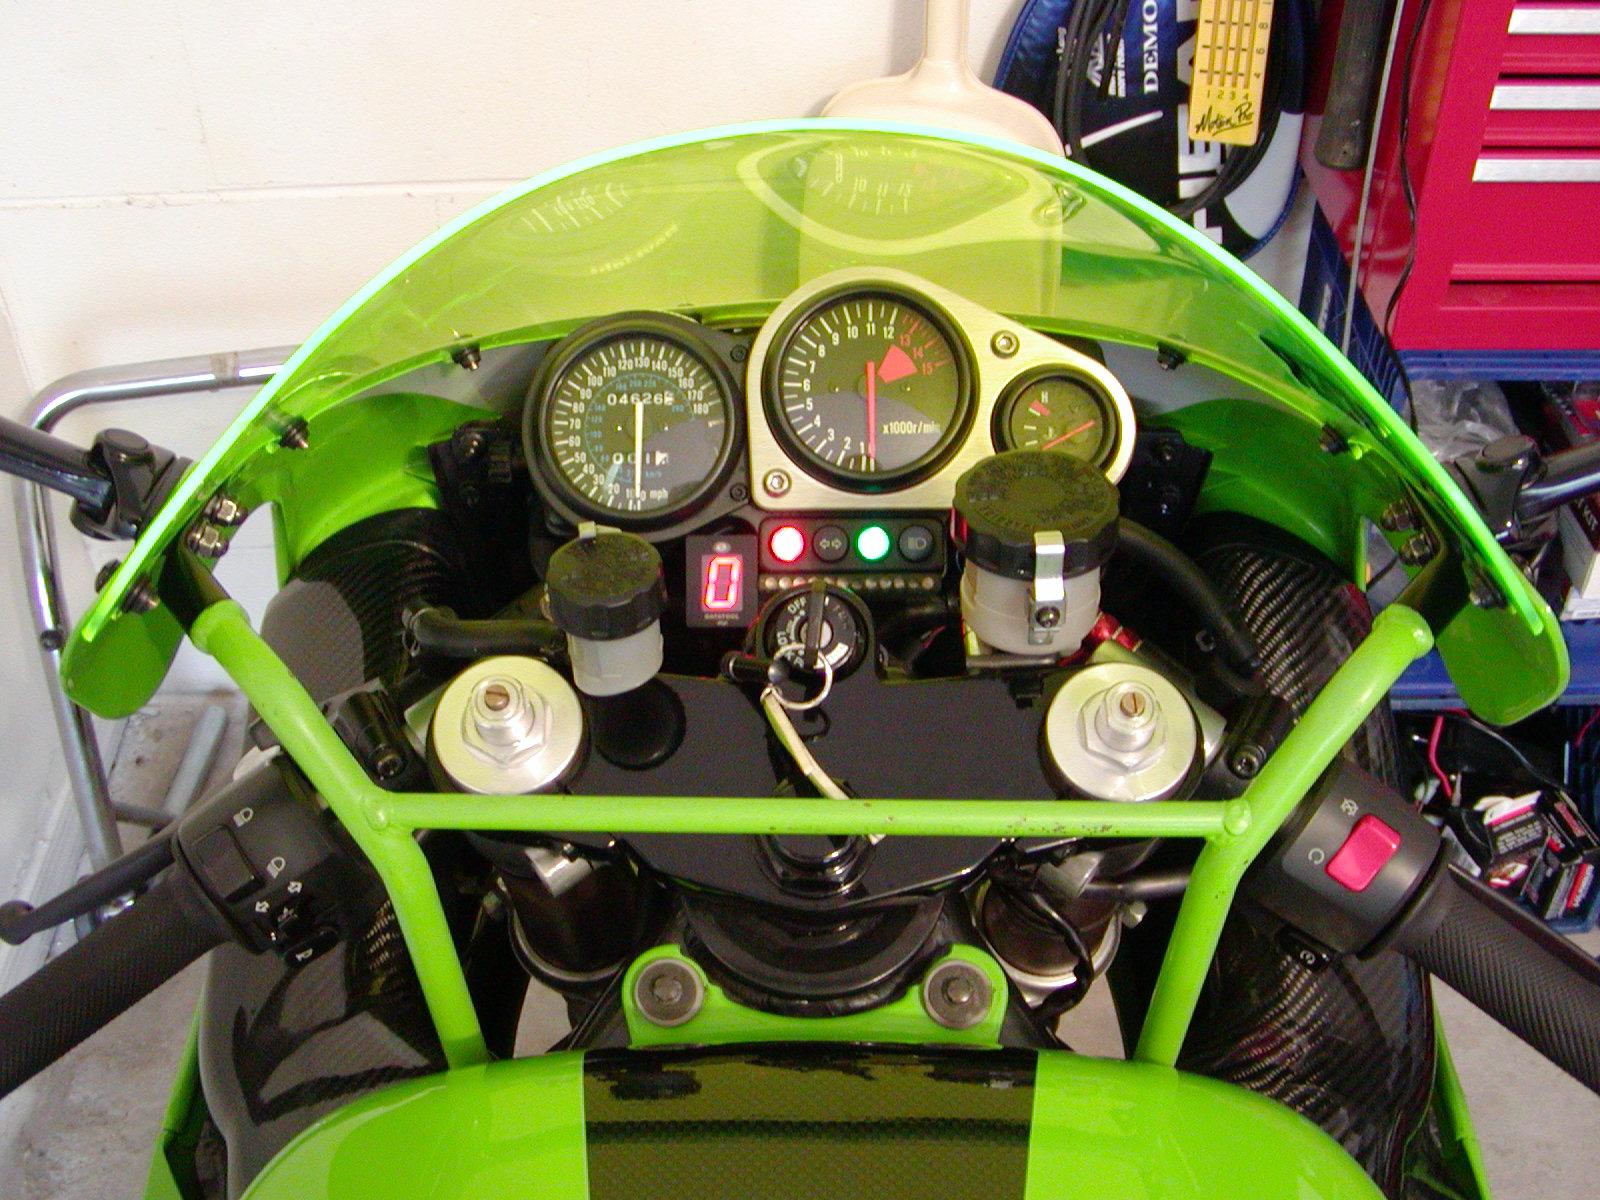 Gear indicator - Sportbikes net